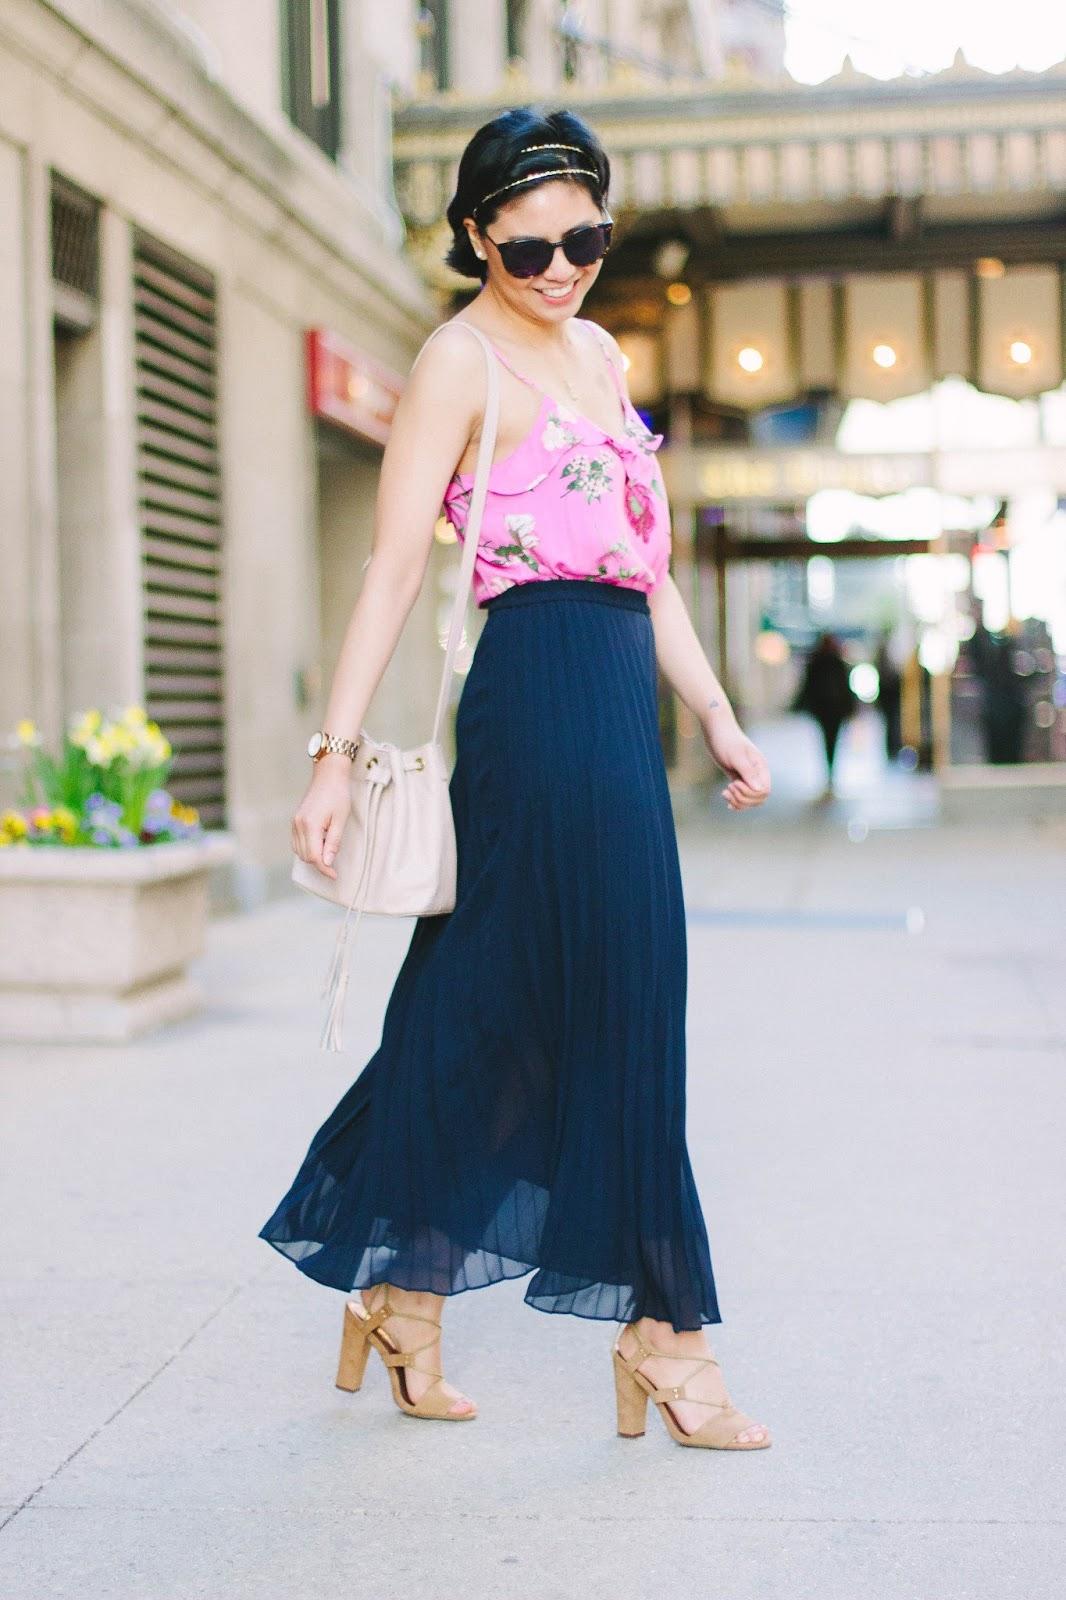 Wearing floral prints for Spring & Summer